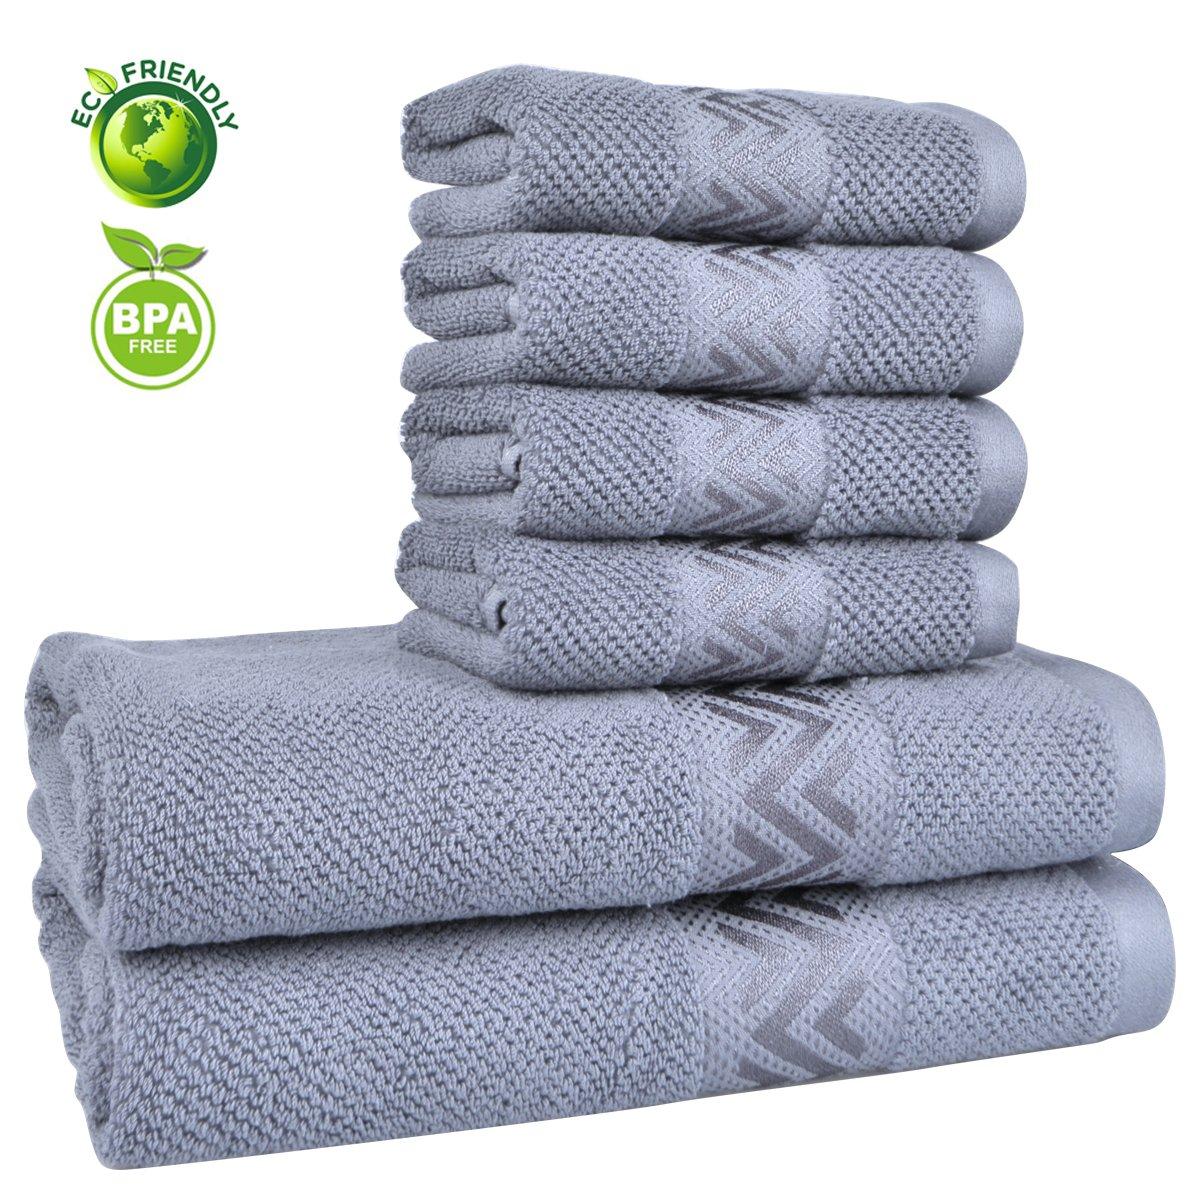 Vanca Bath Towels Sets Cotton Prime Soft Durable Absorbent Large Shower Beach Terry Luxury Classic Design Circlet Wave Stripe Kids Towel (Blue Grey)